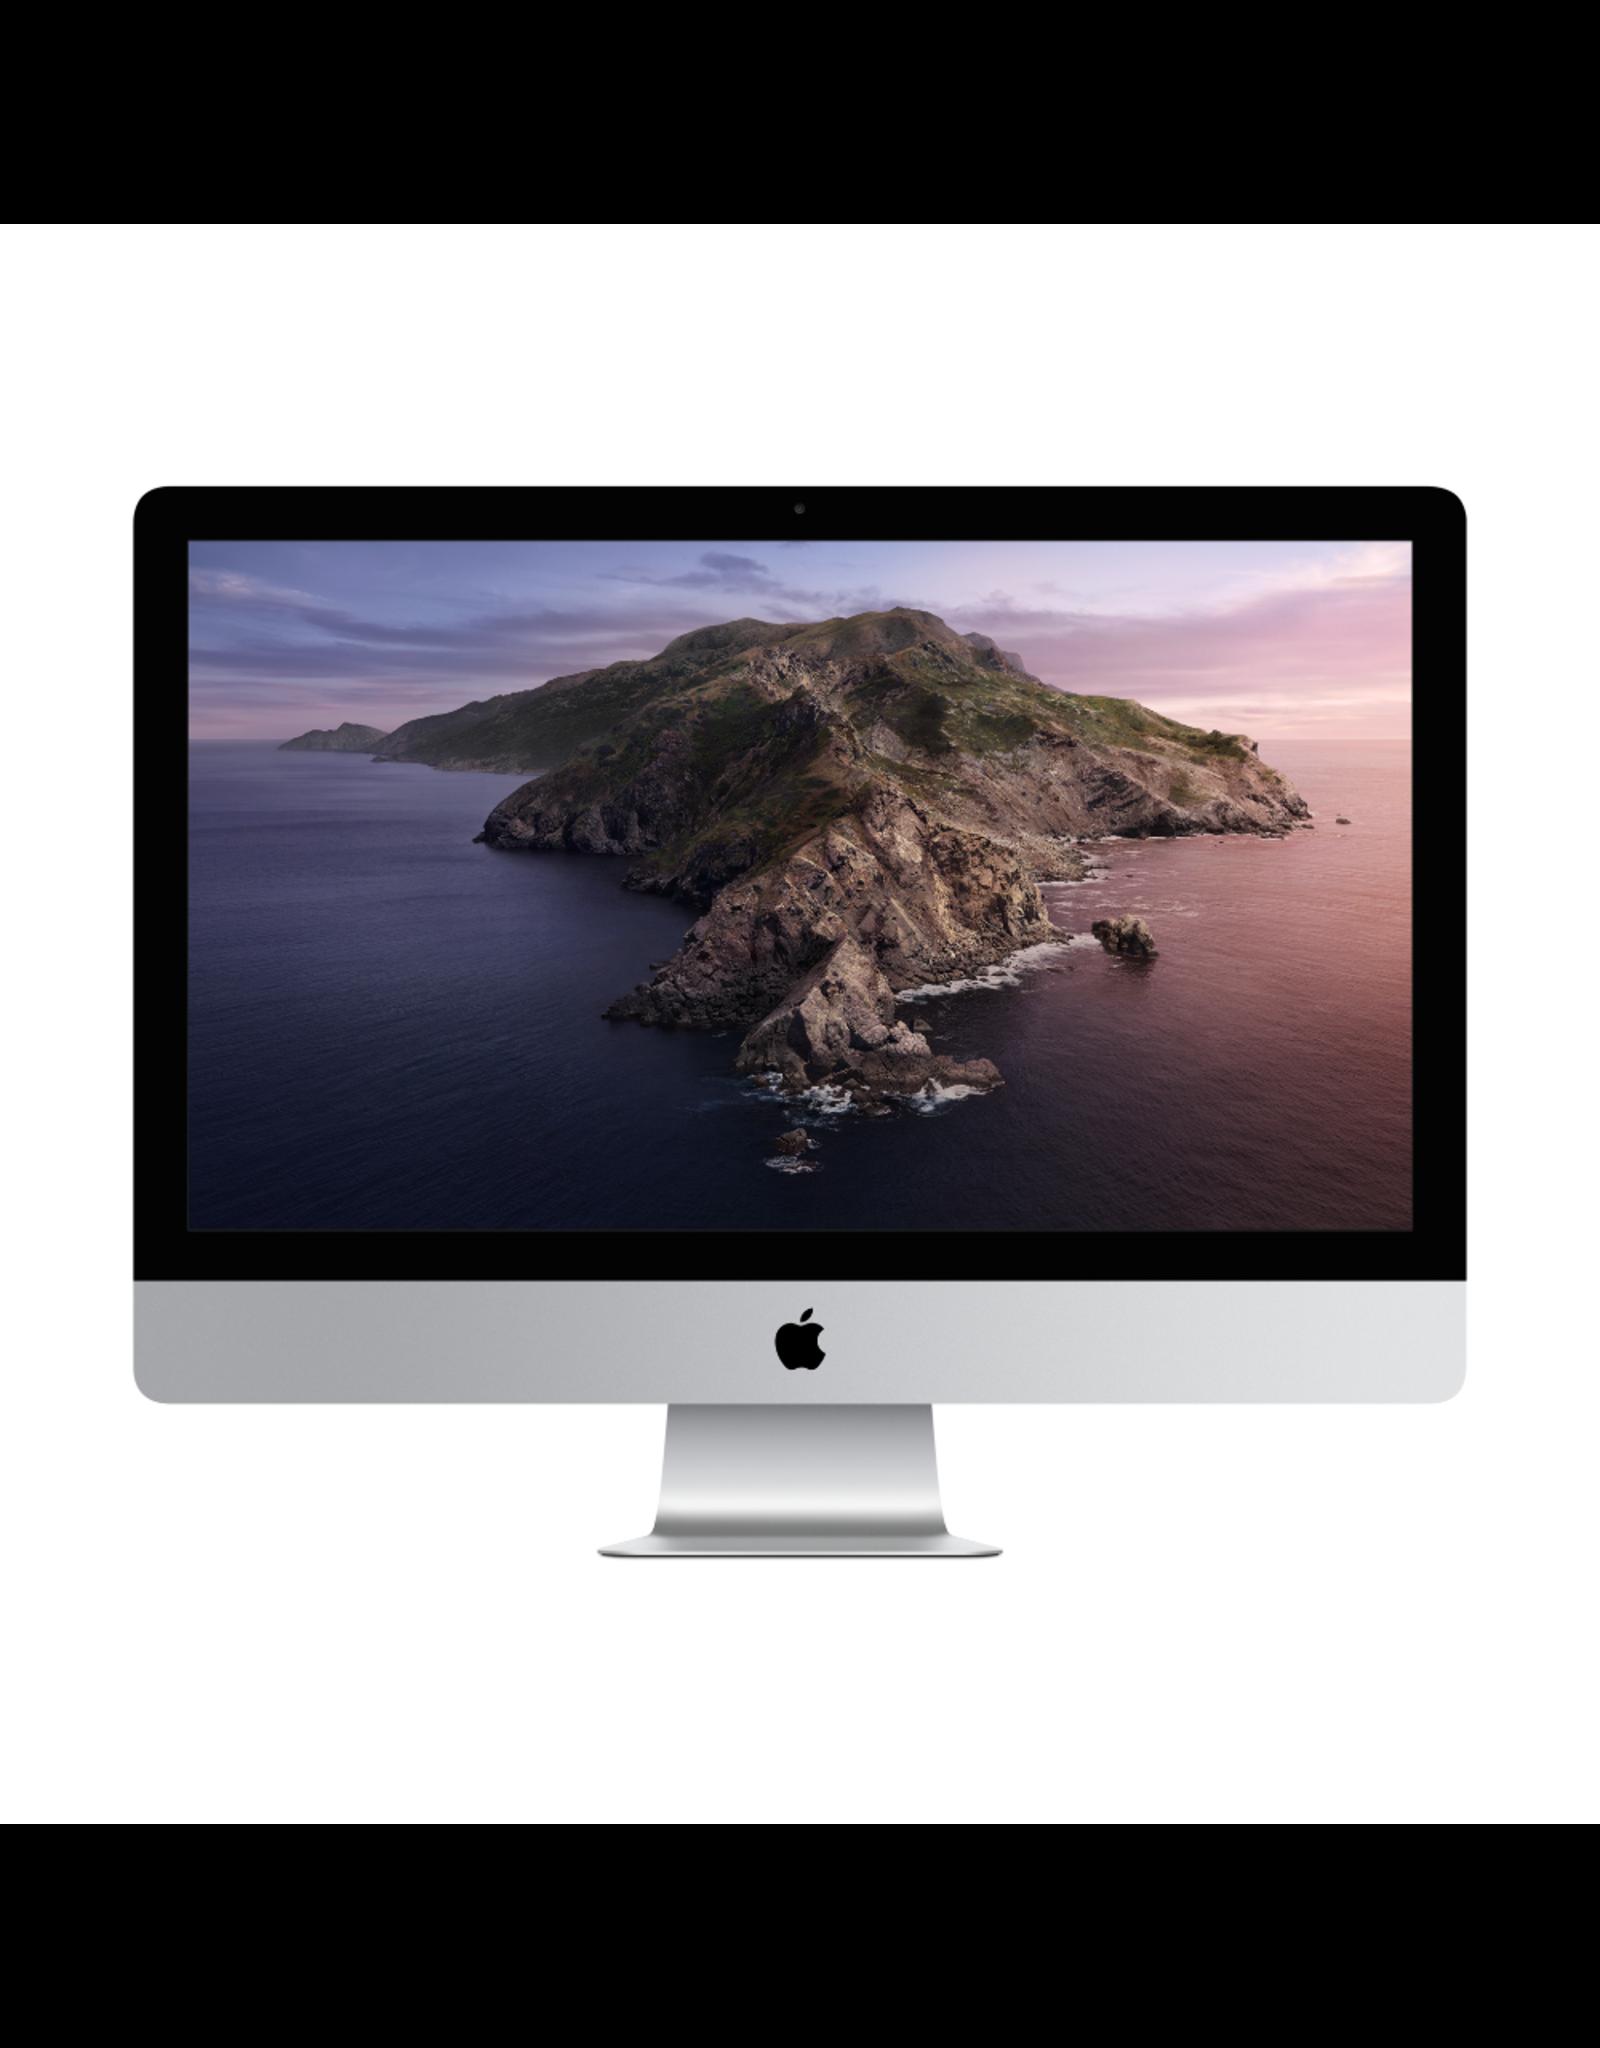 Apple 27-inch iMac Retina 5K 3.3GHz 6-core 10th-generation Intel Core i5/8GB/512GB SSD/Radeon Pro 5300 4GB